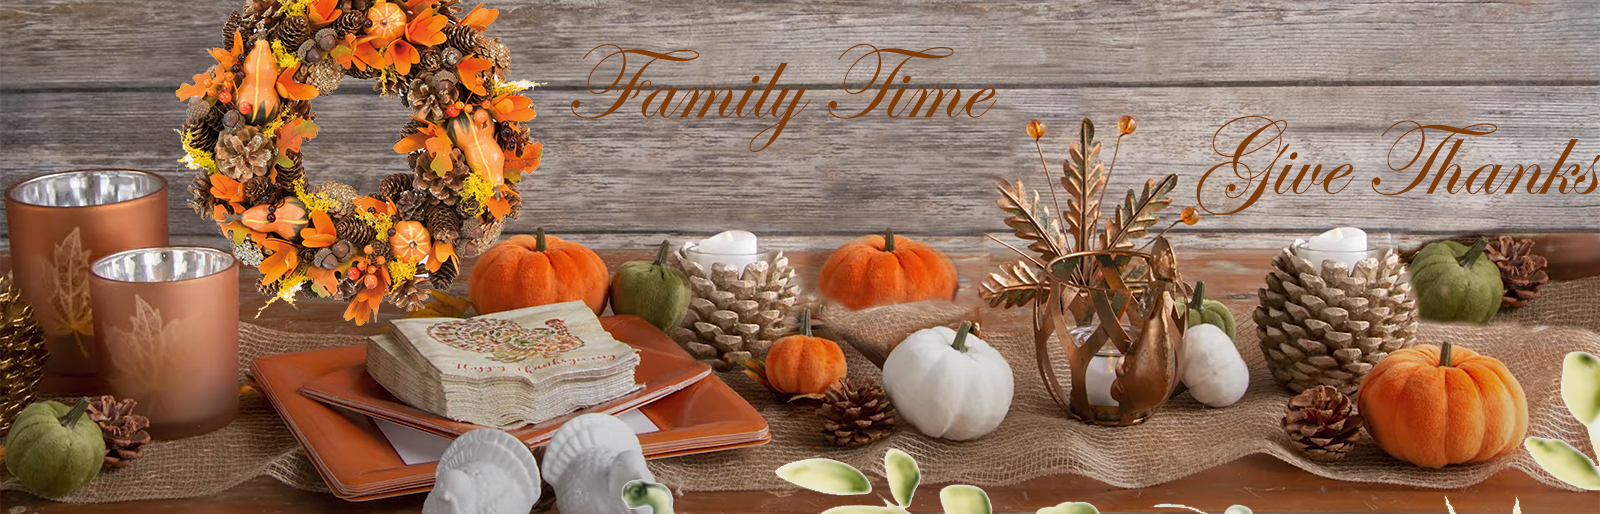 Fall Thanksgiving 2021